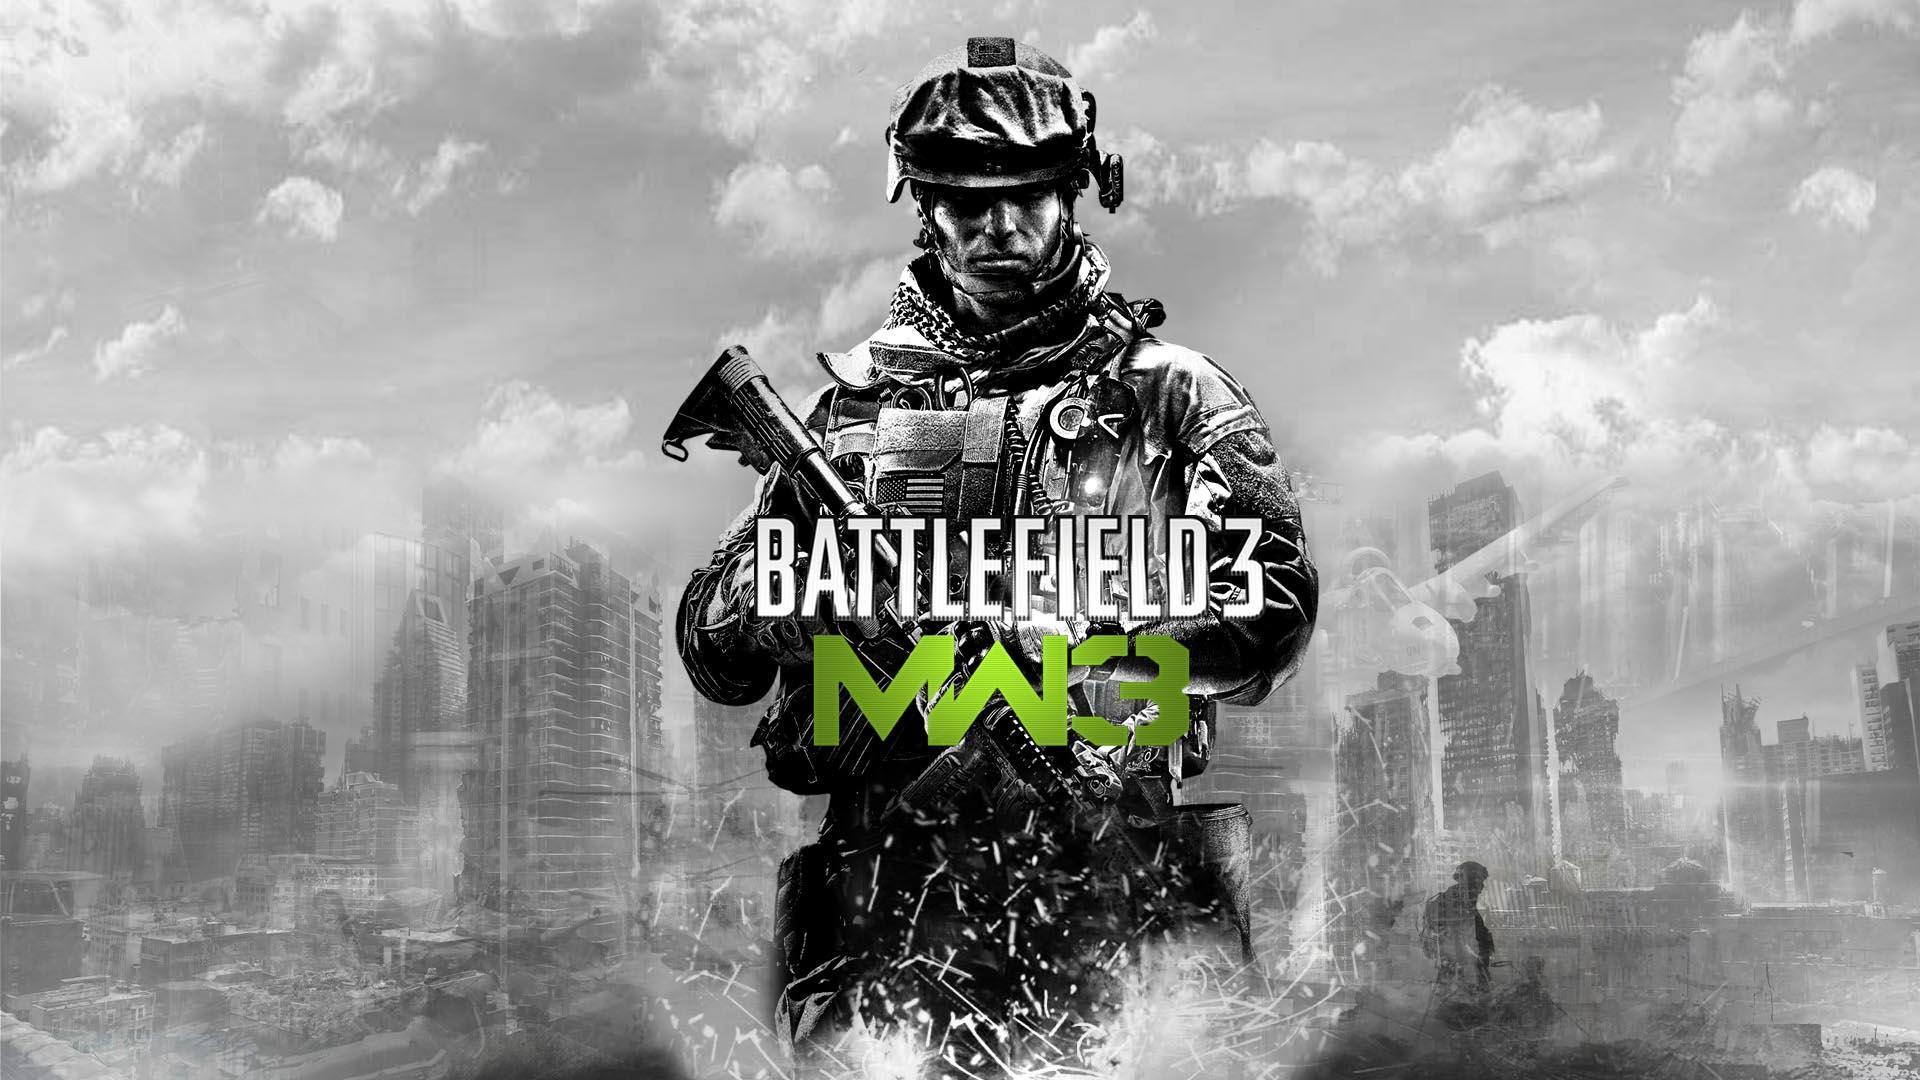 Free Download Call Of Duty Modern Warfare 3 Wallpapers 1920x1080